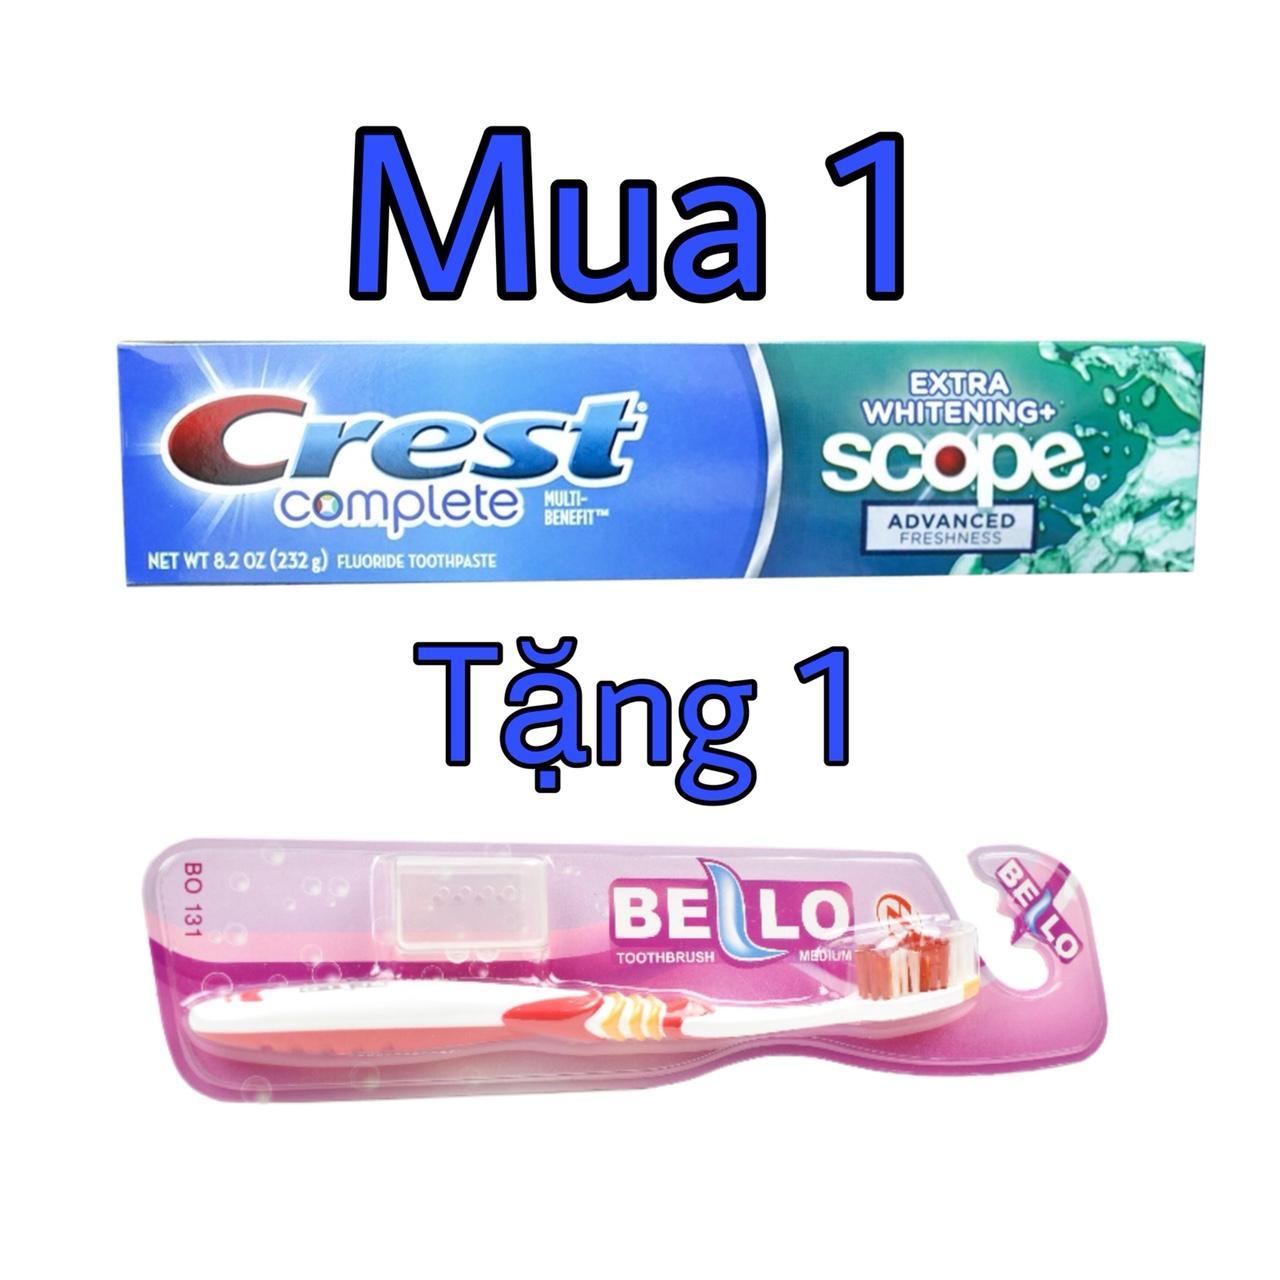 Kem đánh răng  MỸ CREST COMPLETE EXTRA WHITENING SCOPE 232G